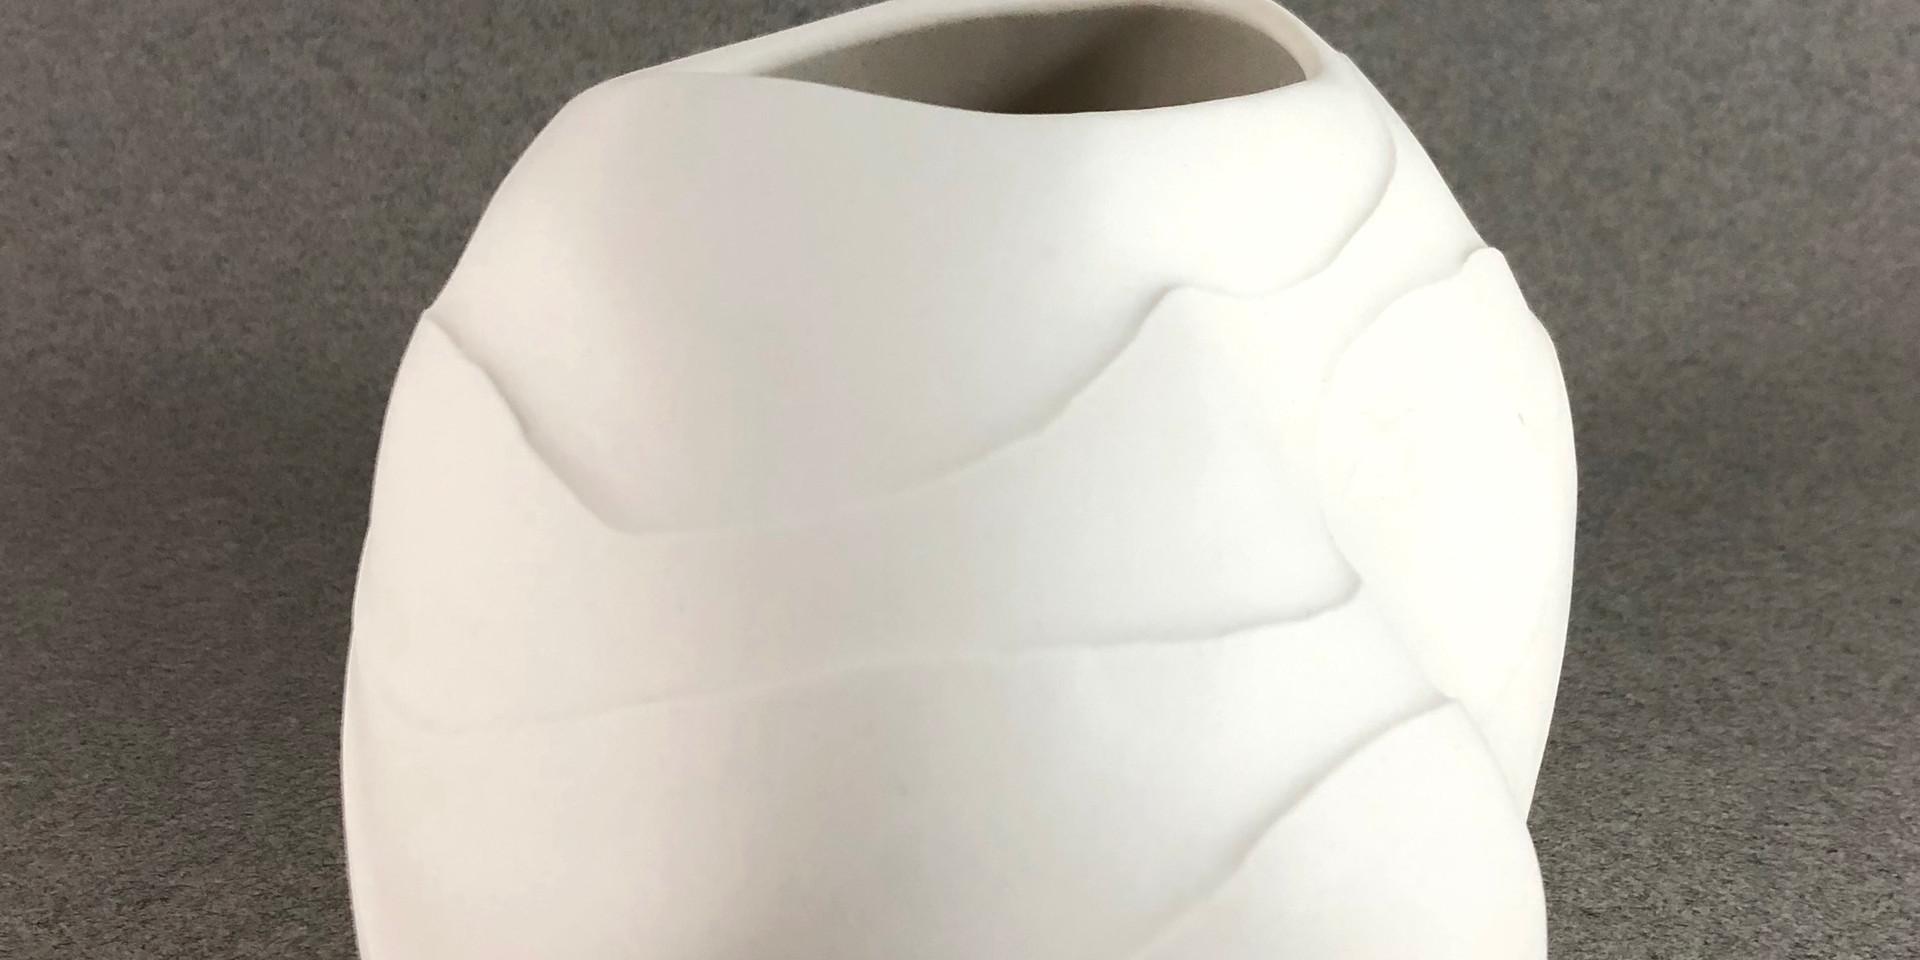 Serenity Vessel - Large White (2020)